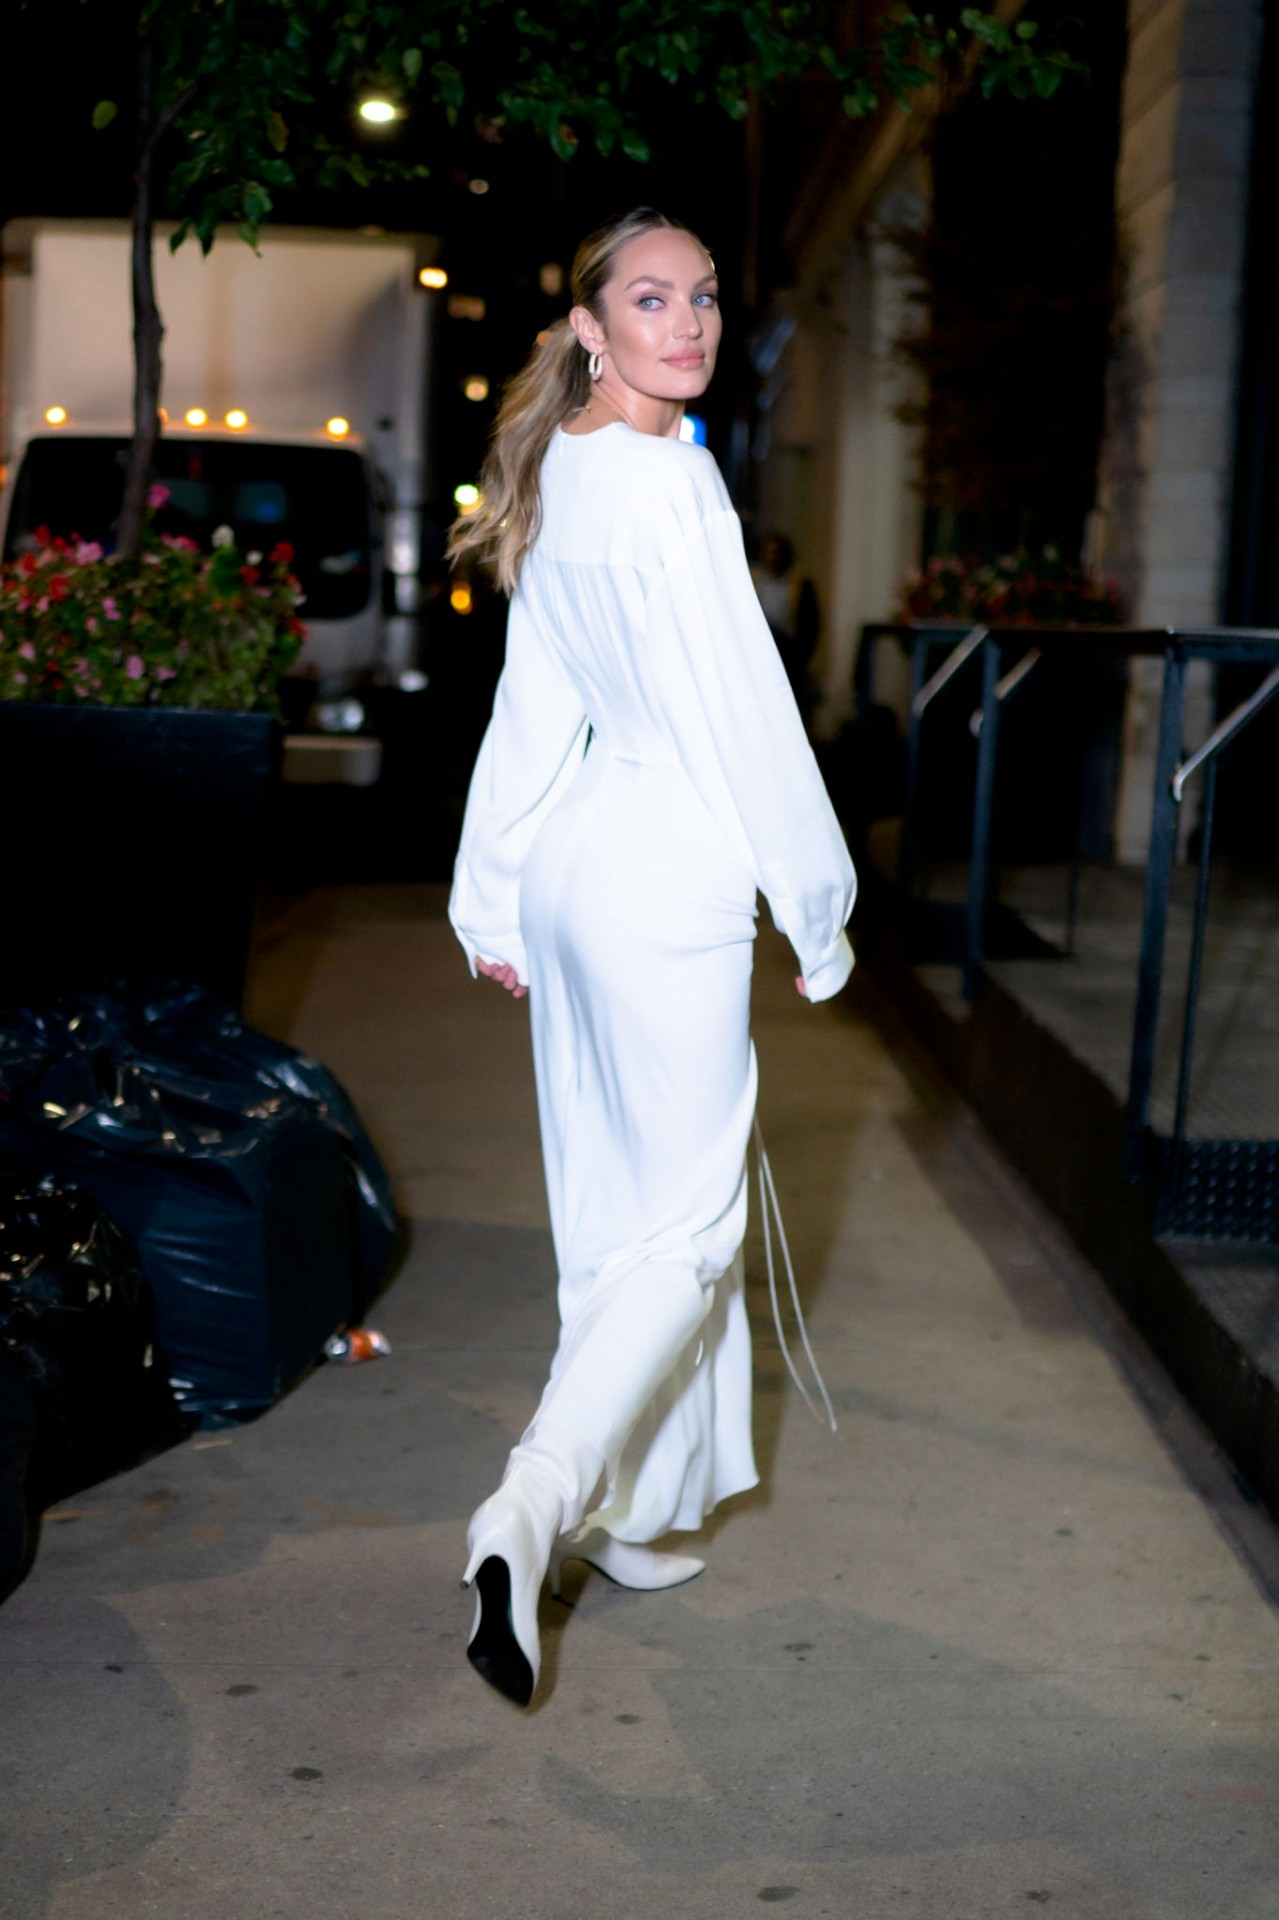 Candice Swanepoel Sexy White Dress